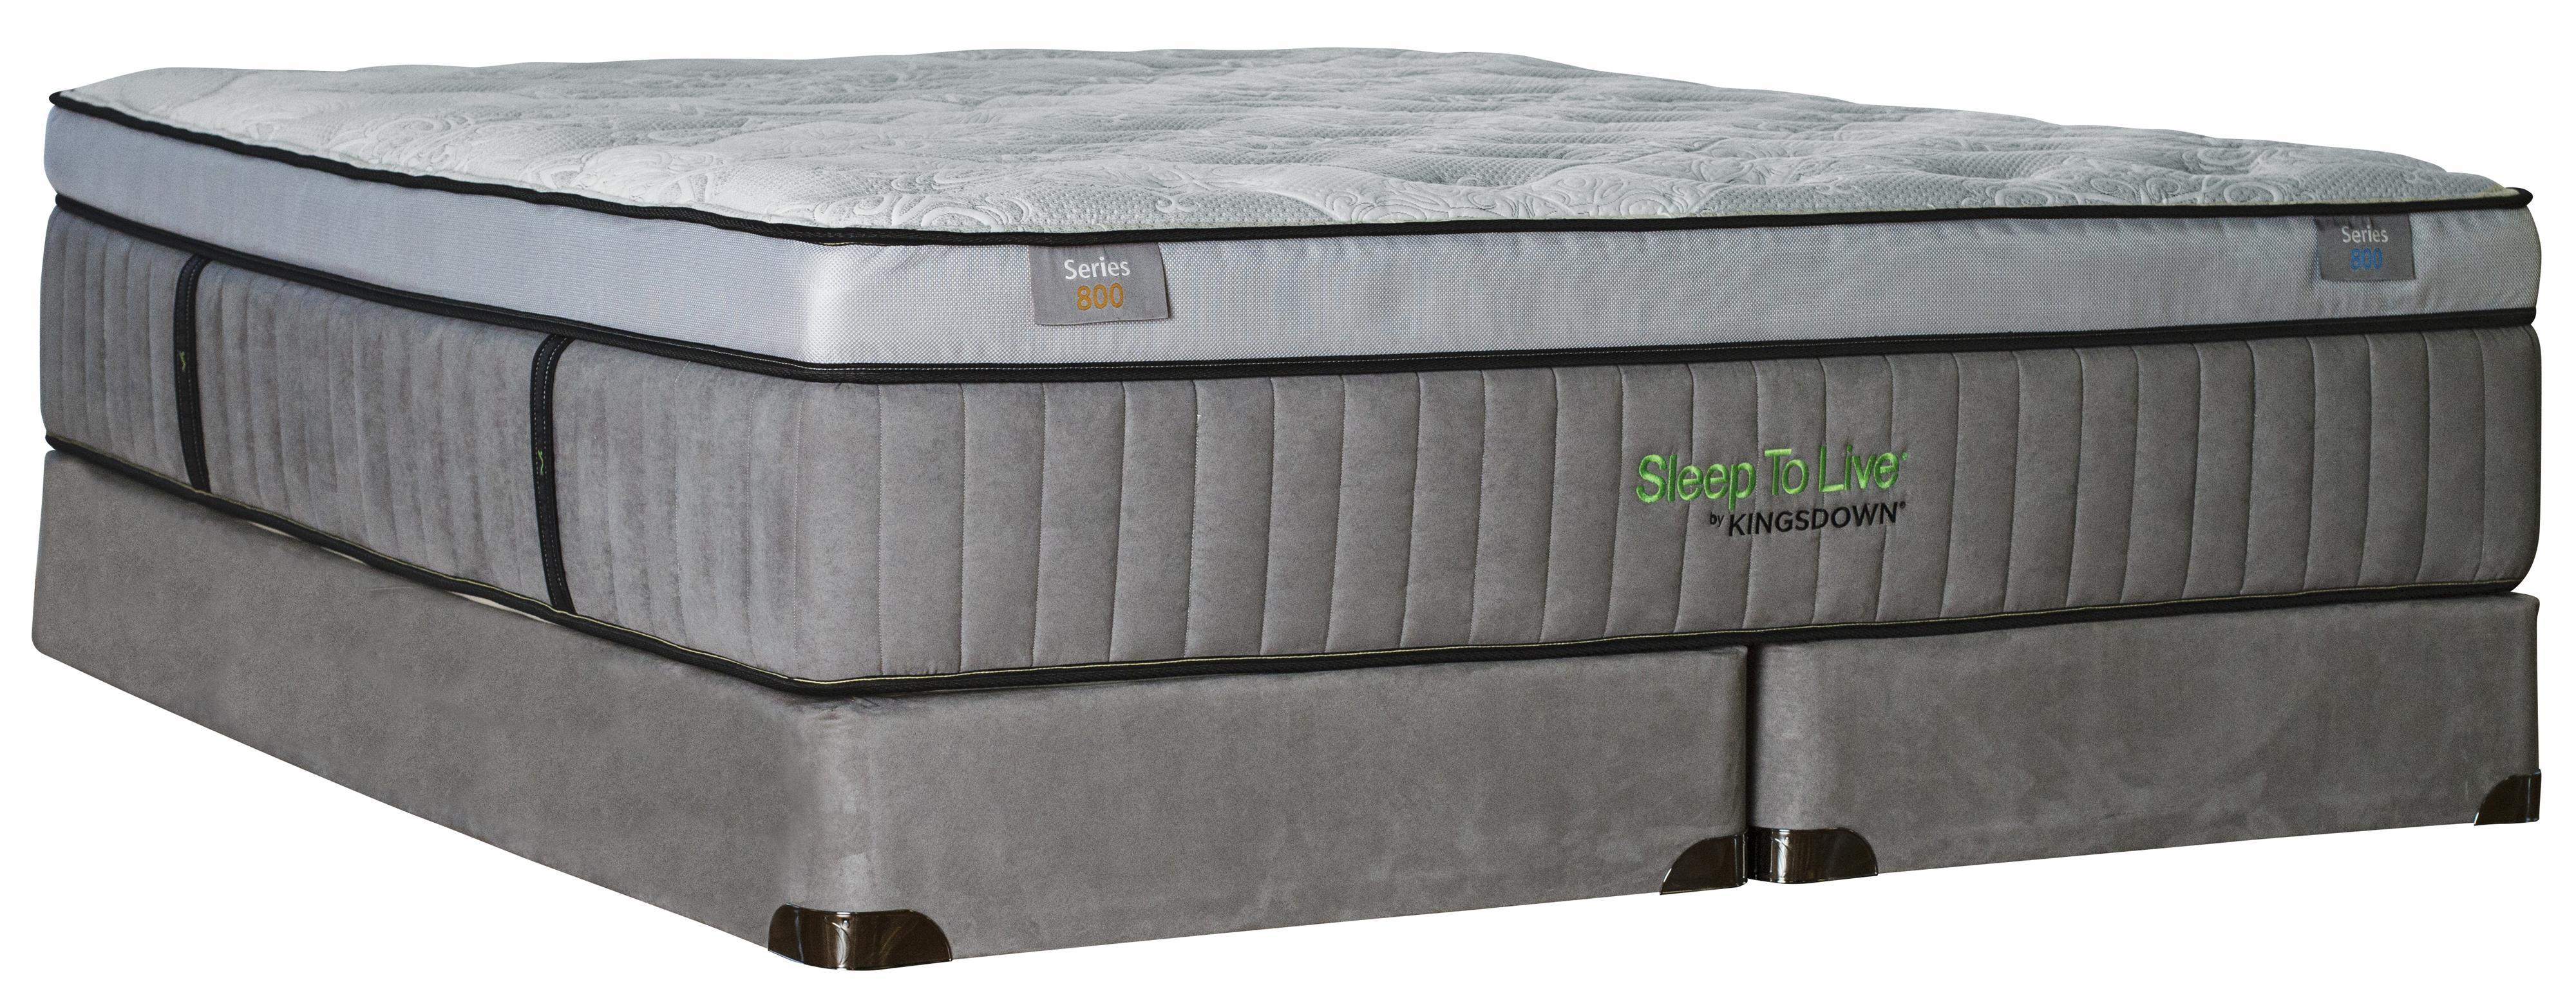 Kingsdown Sleep to Live 800 Queen Luxurios Box Top Mattress Set - Item Number: Series800-Q+1128SFH-Q